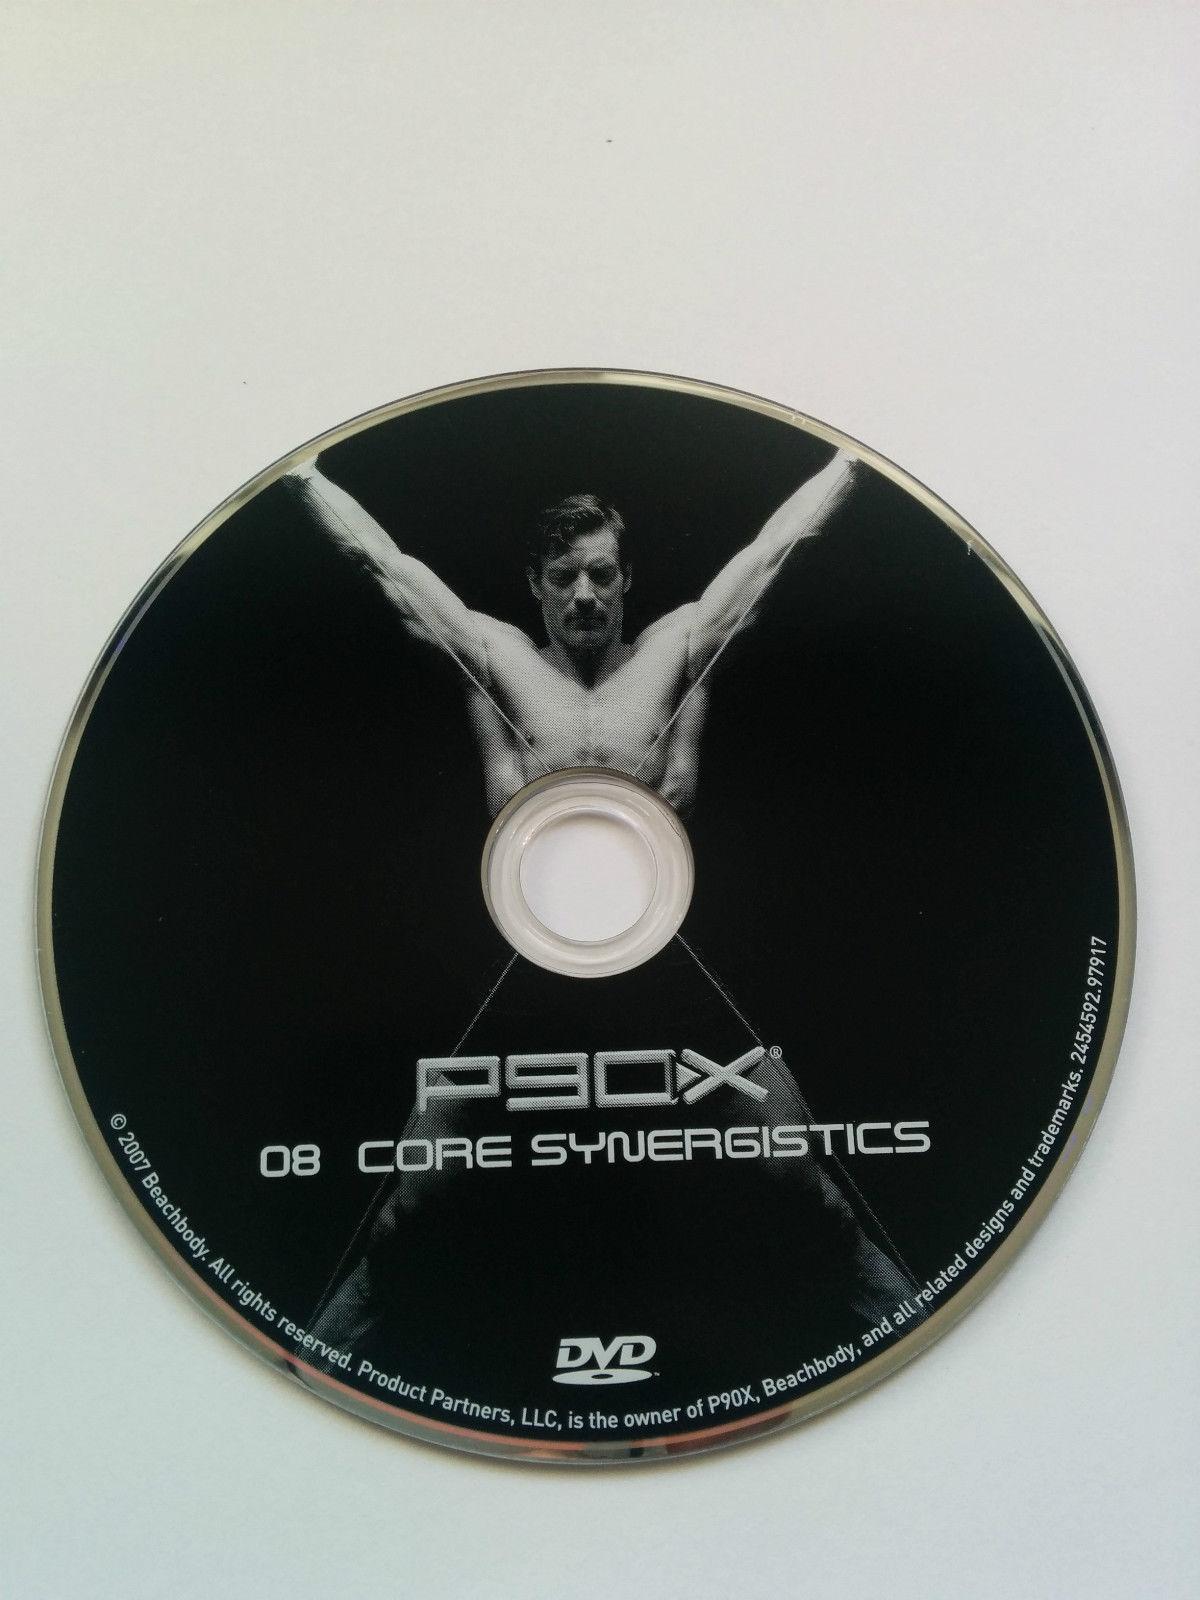 P90x The Workouts Core Synergistics Disc 08 Beachbody